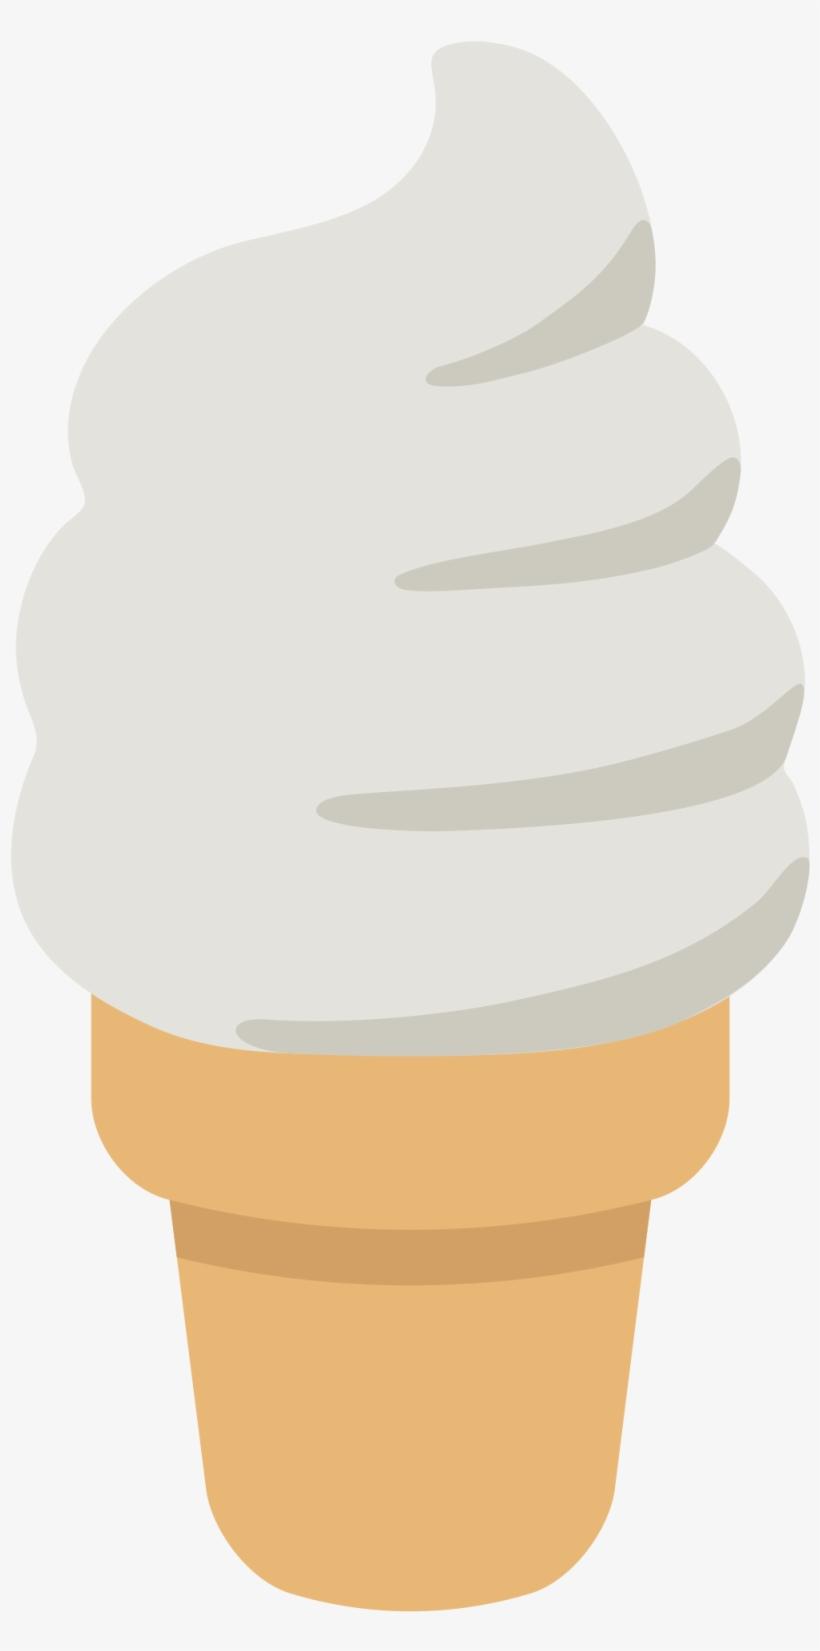 Soft Serve Ice Creams,Ice cream cone,Frozen dessert,Ice.